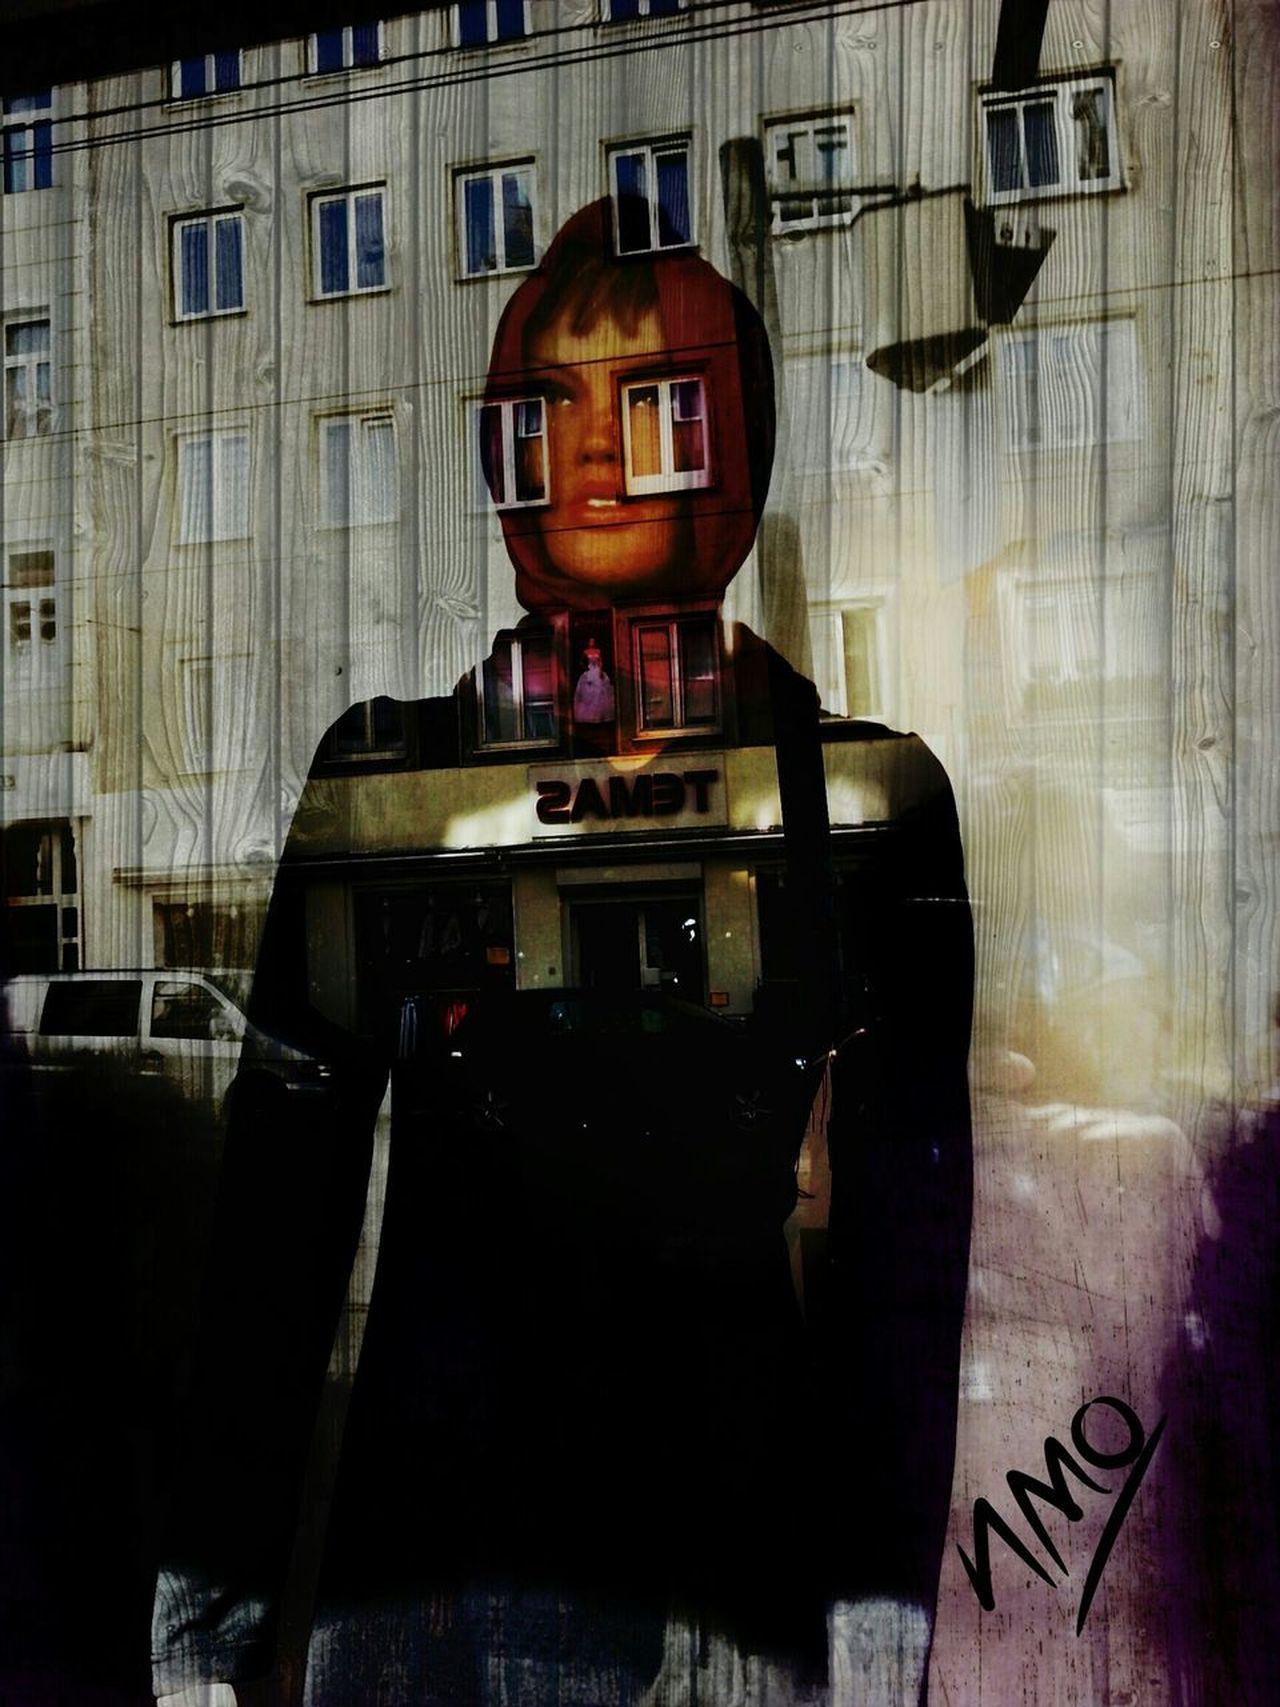 mannequin. Growing Better Hello World The Portraitist - 2015 EyeEm Awards YMO Ottakring Austria New Reality